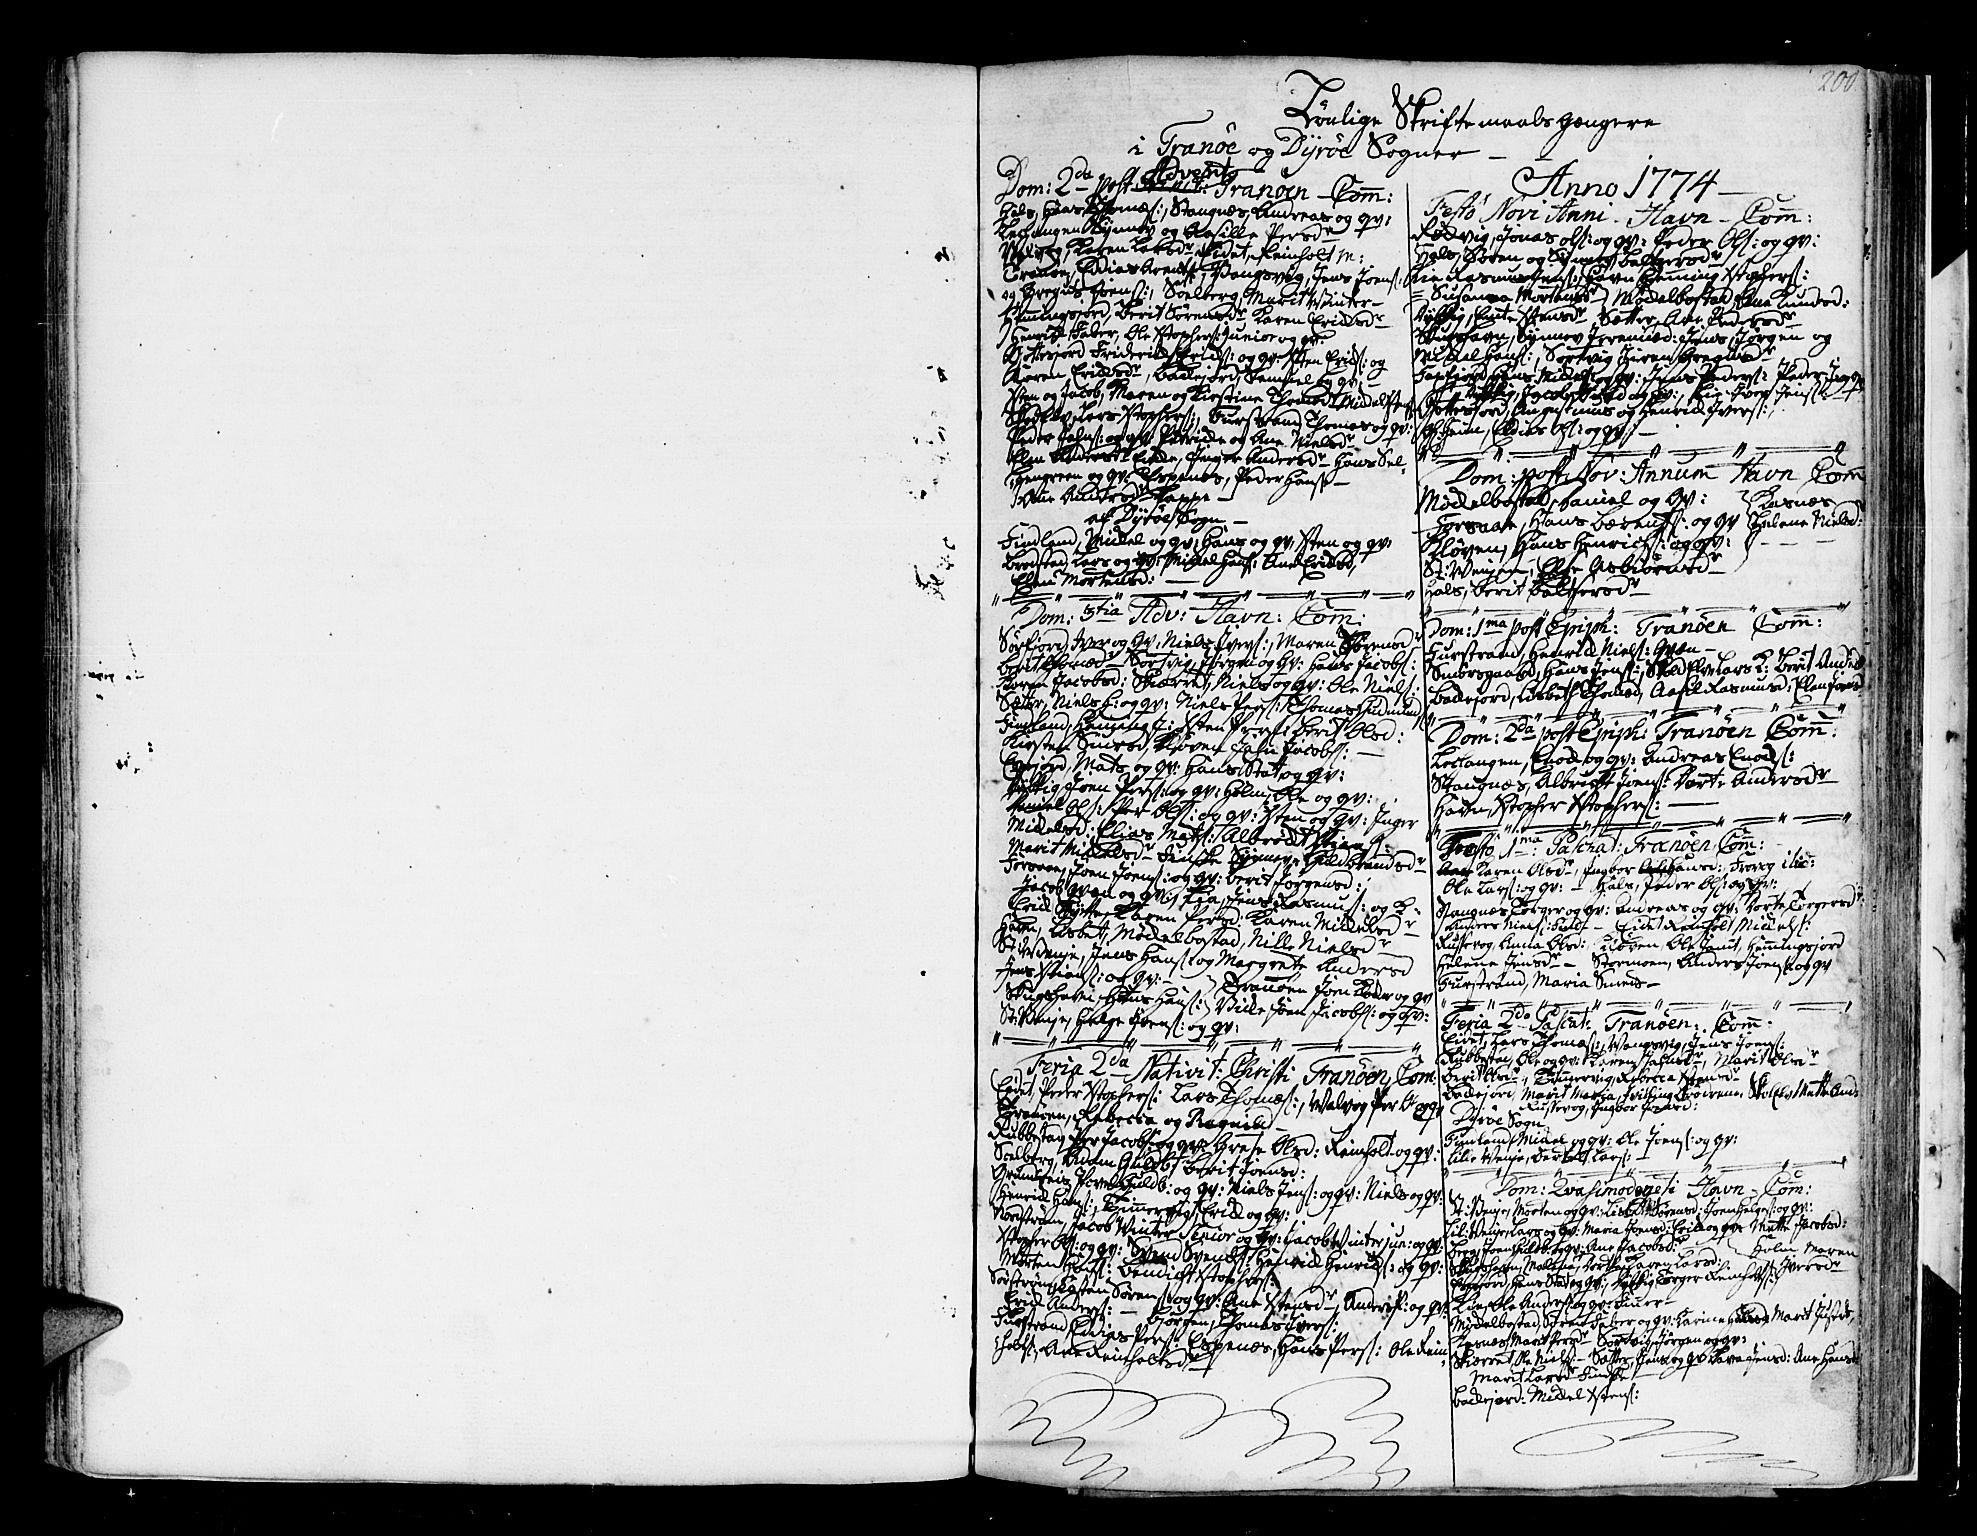 SATØ, Tranøy sokneprestkontor, I/Ia/Iaa/L0002kirke: Ministerialbok nr. 2, 1773-1806, s. 200